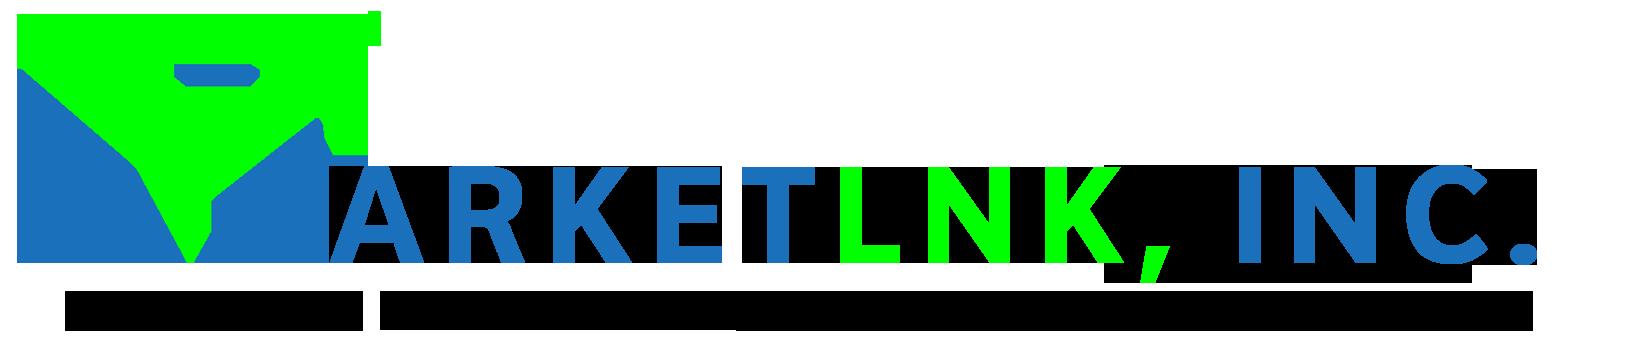 MarketLnk logo